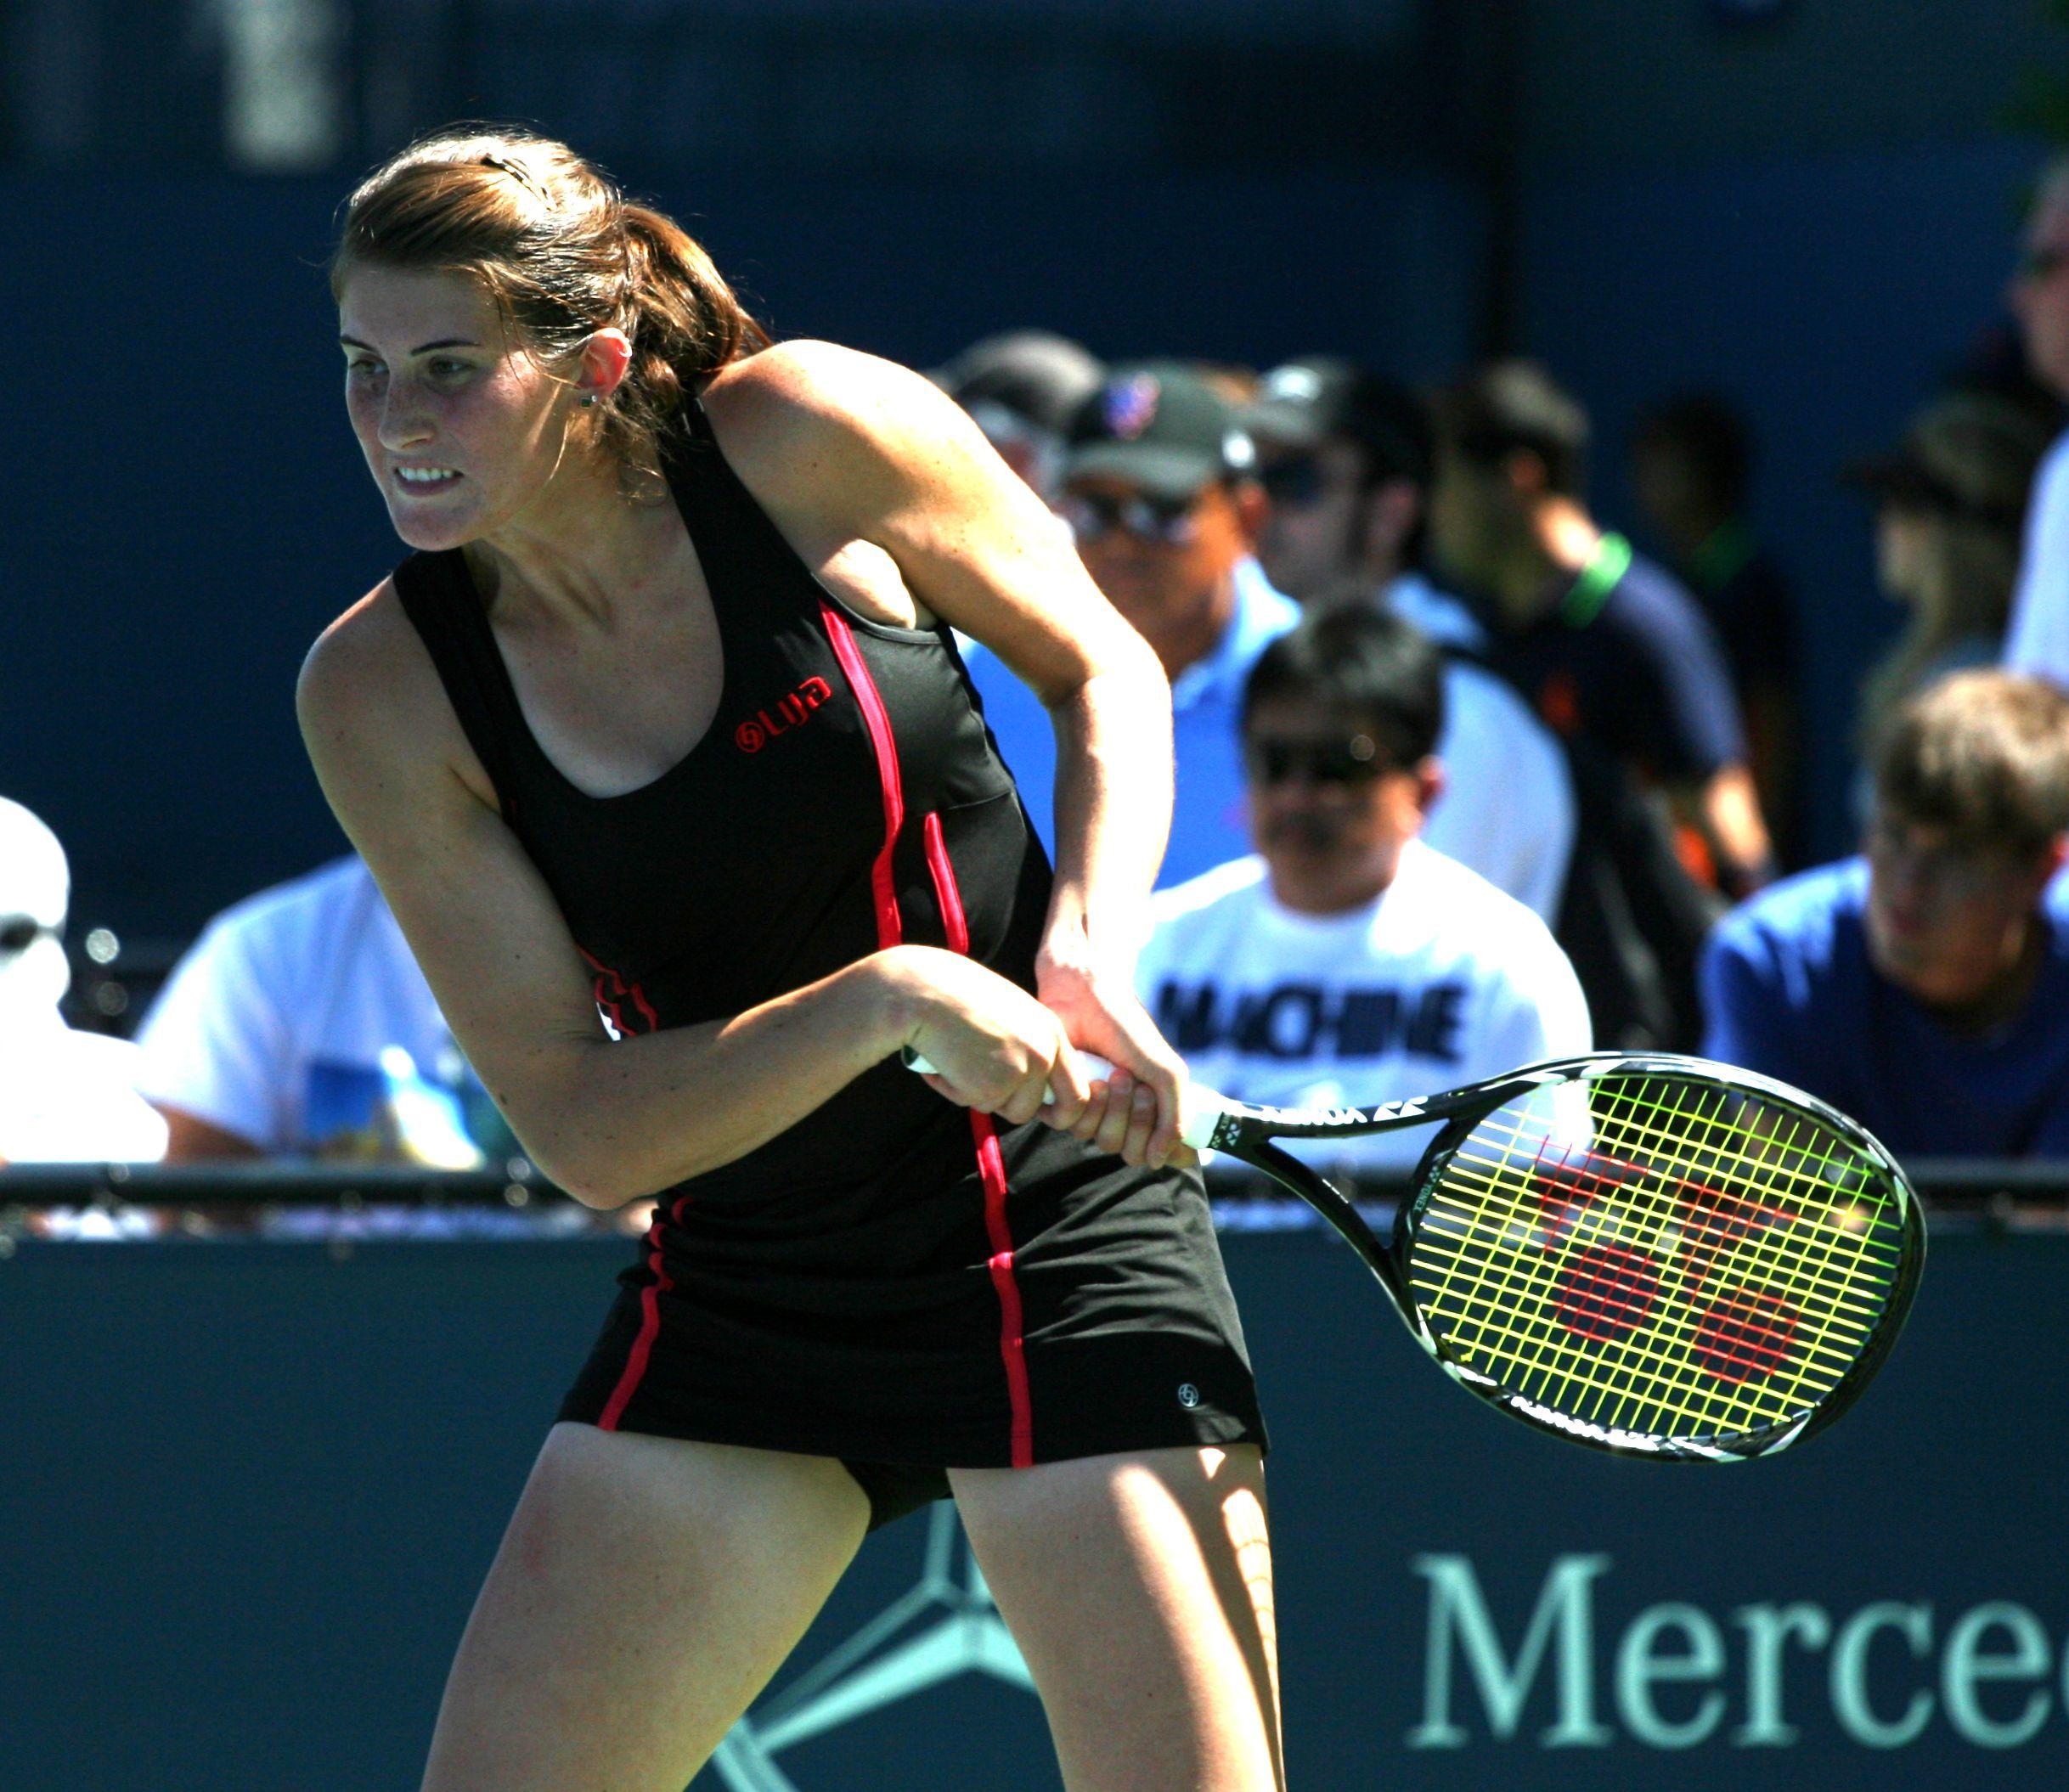 Wta: Rebecca Marino Redefines The Term Powerball